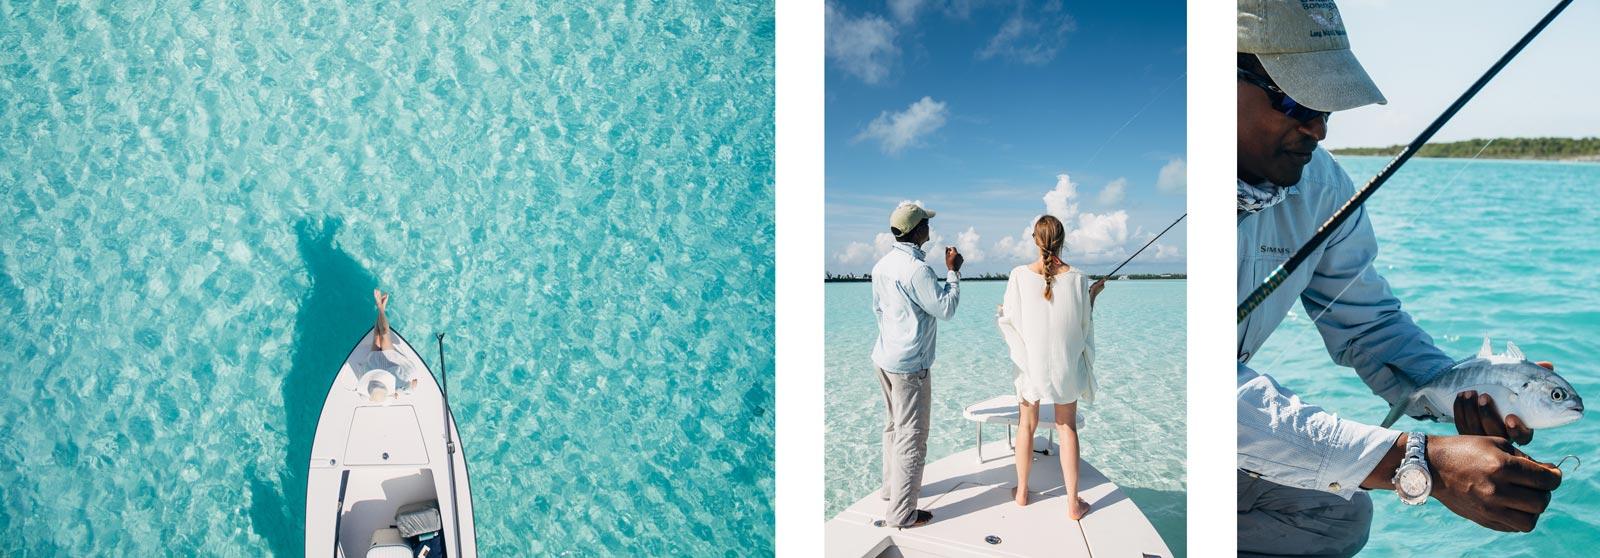 Bonefish avec Docky, Long Island, Bahamas